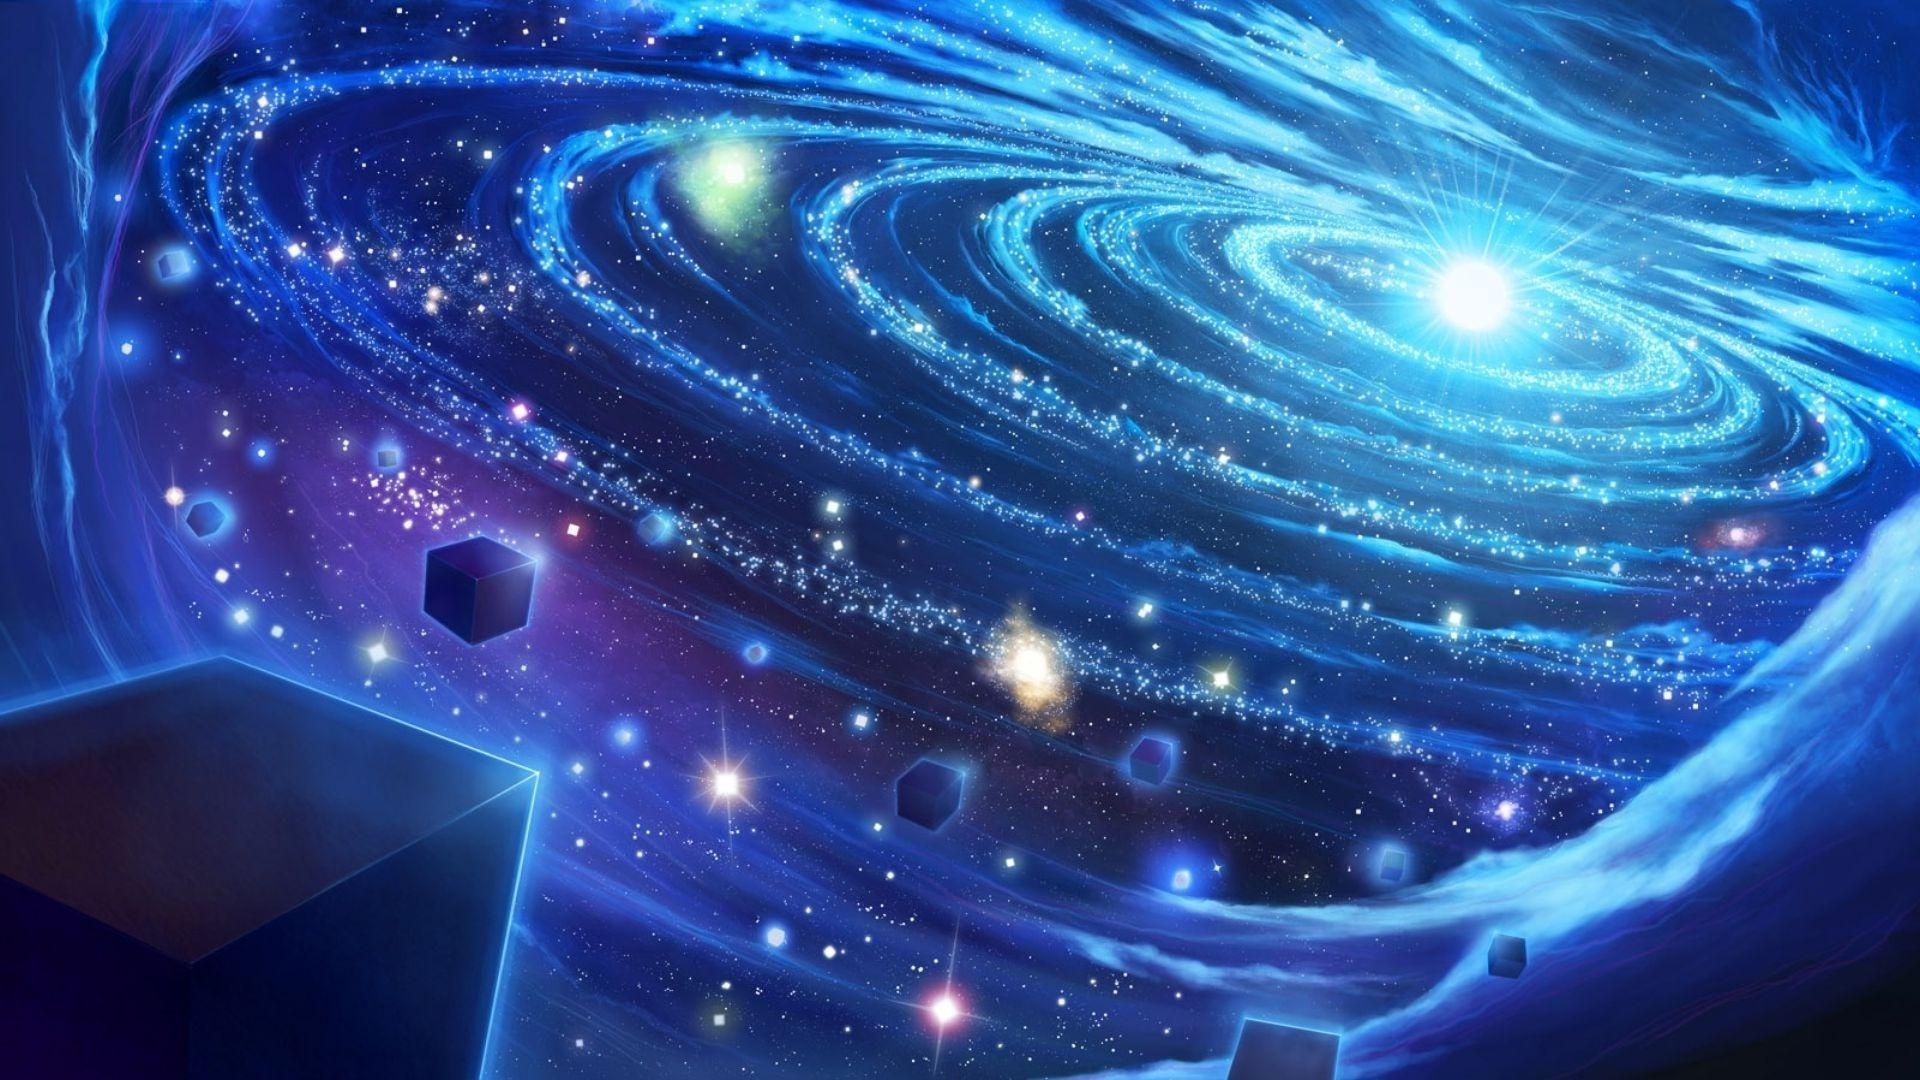 Space Wallpapers Set For Desktop | Vigorous Art